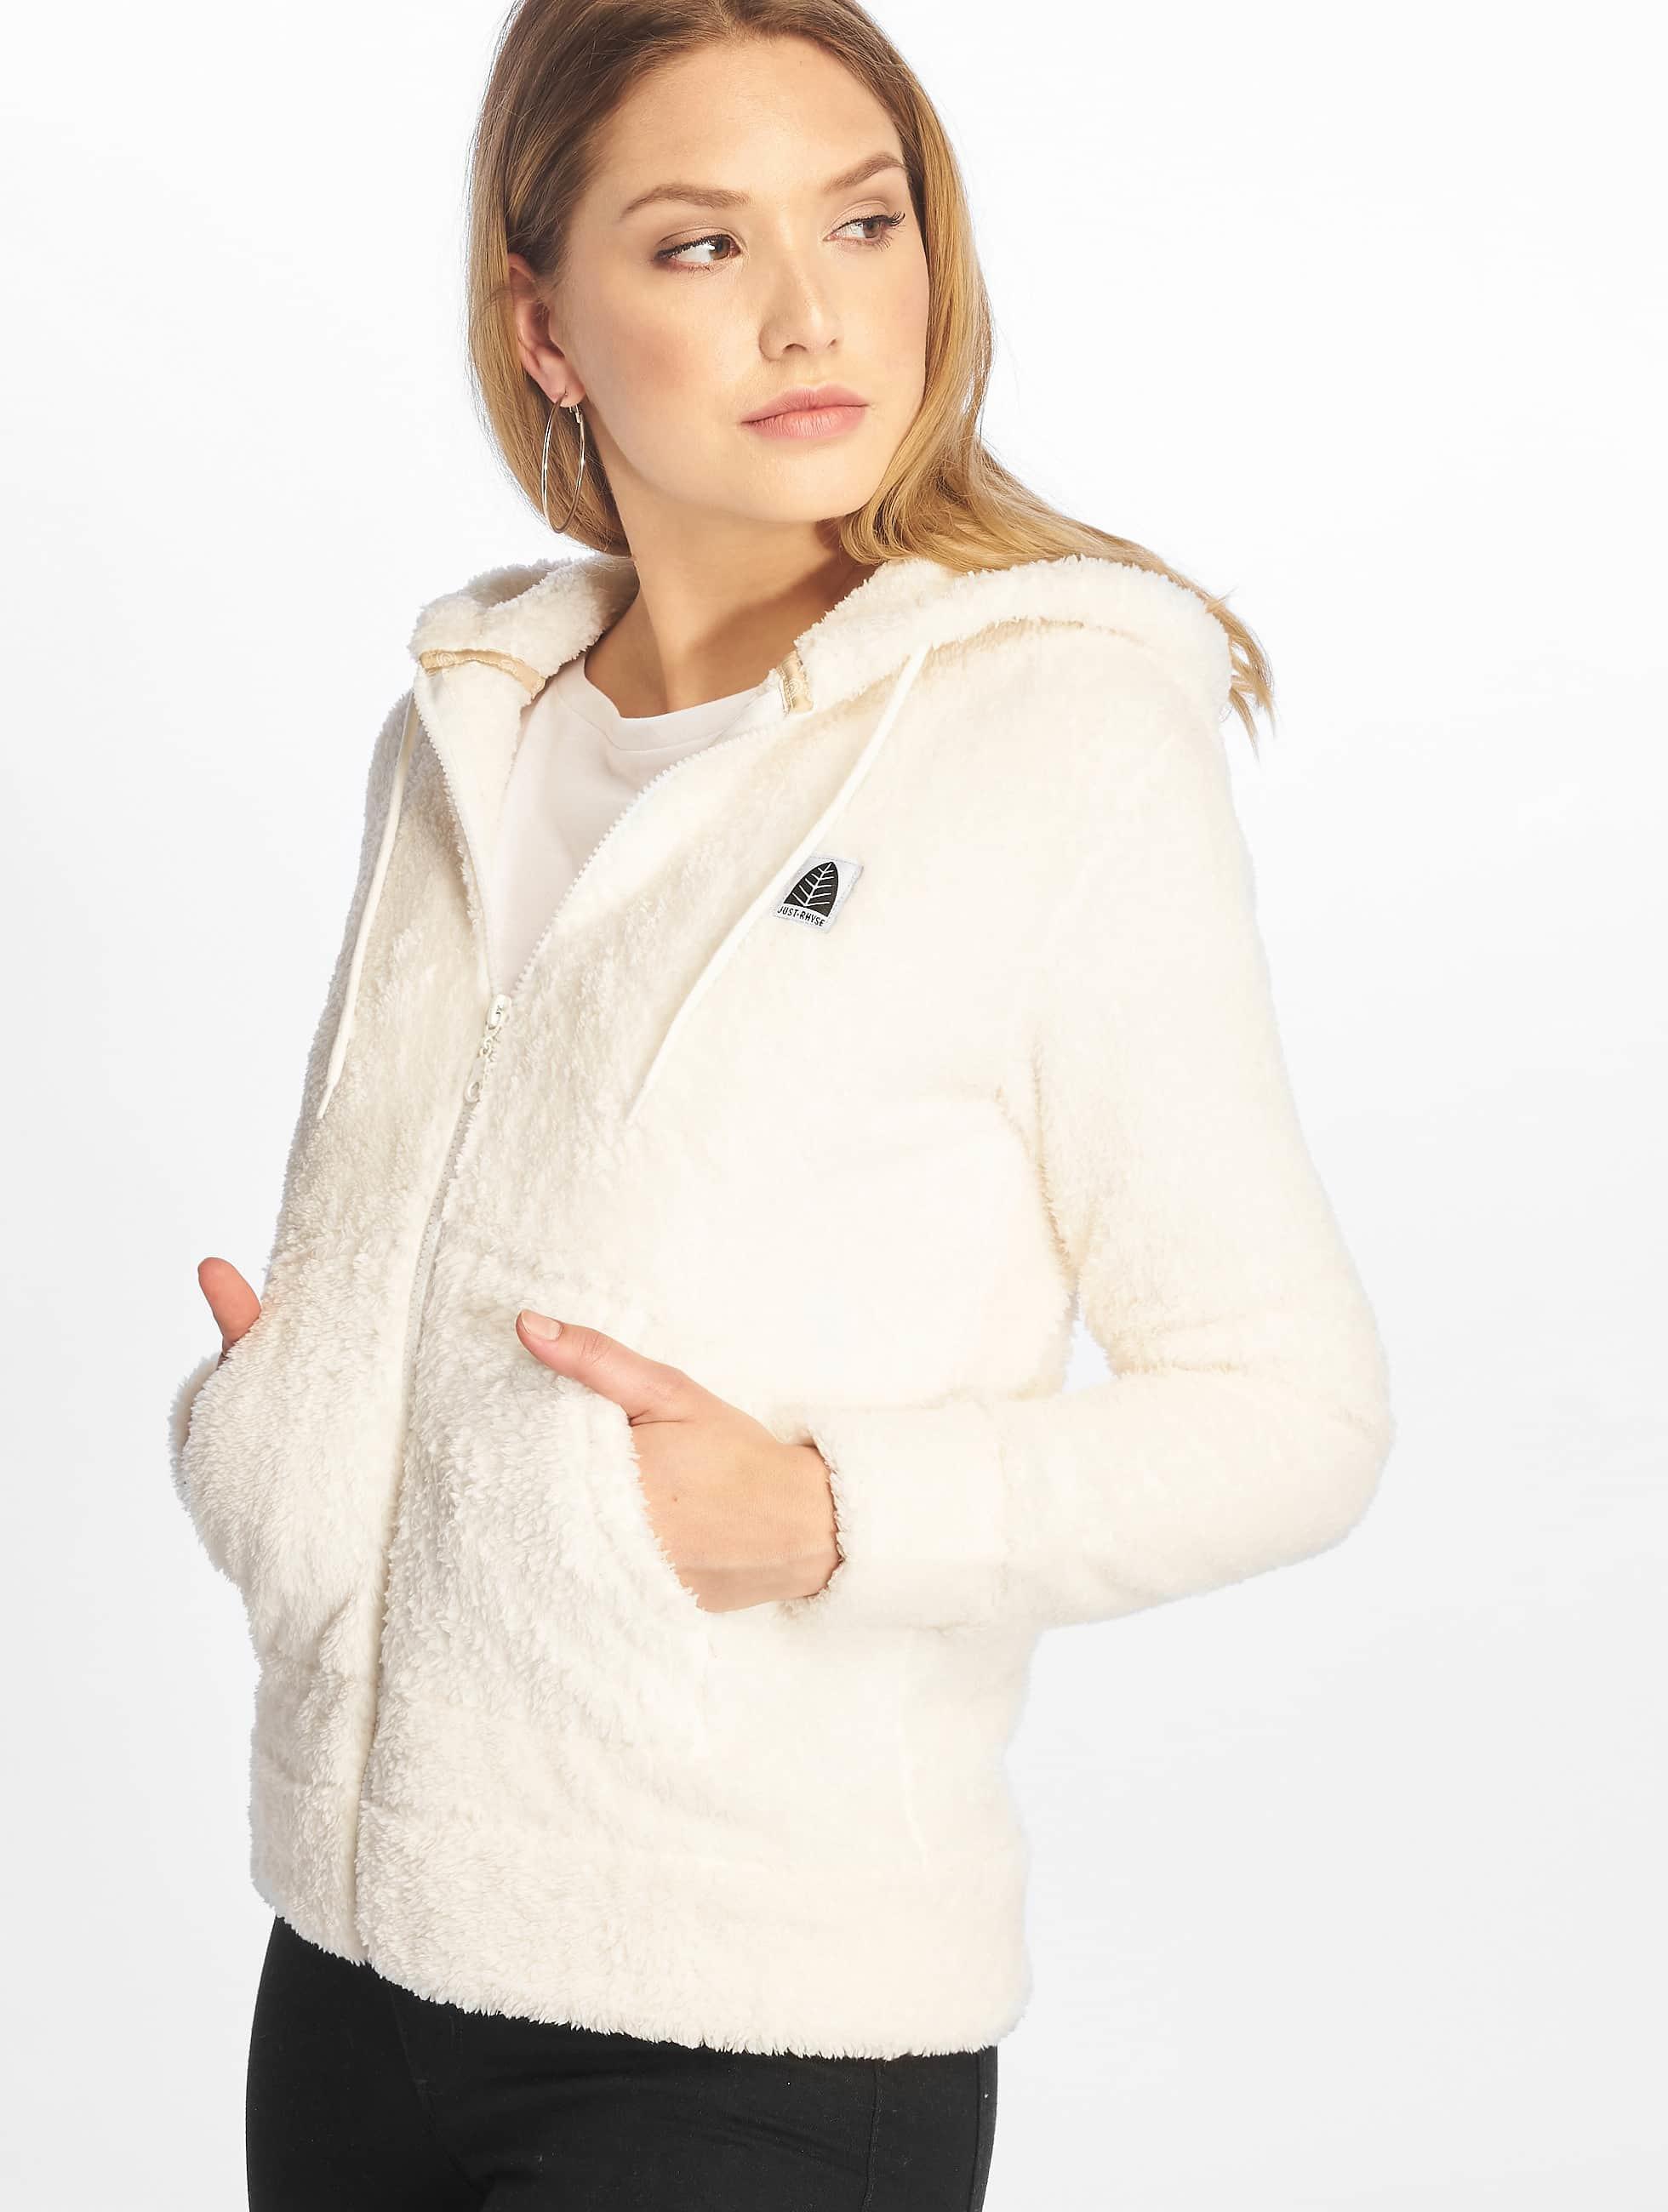 Just Rhyse / Zip Hoodie Arequipa in white XS